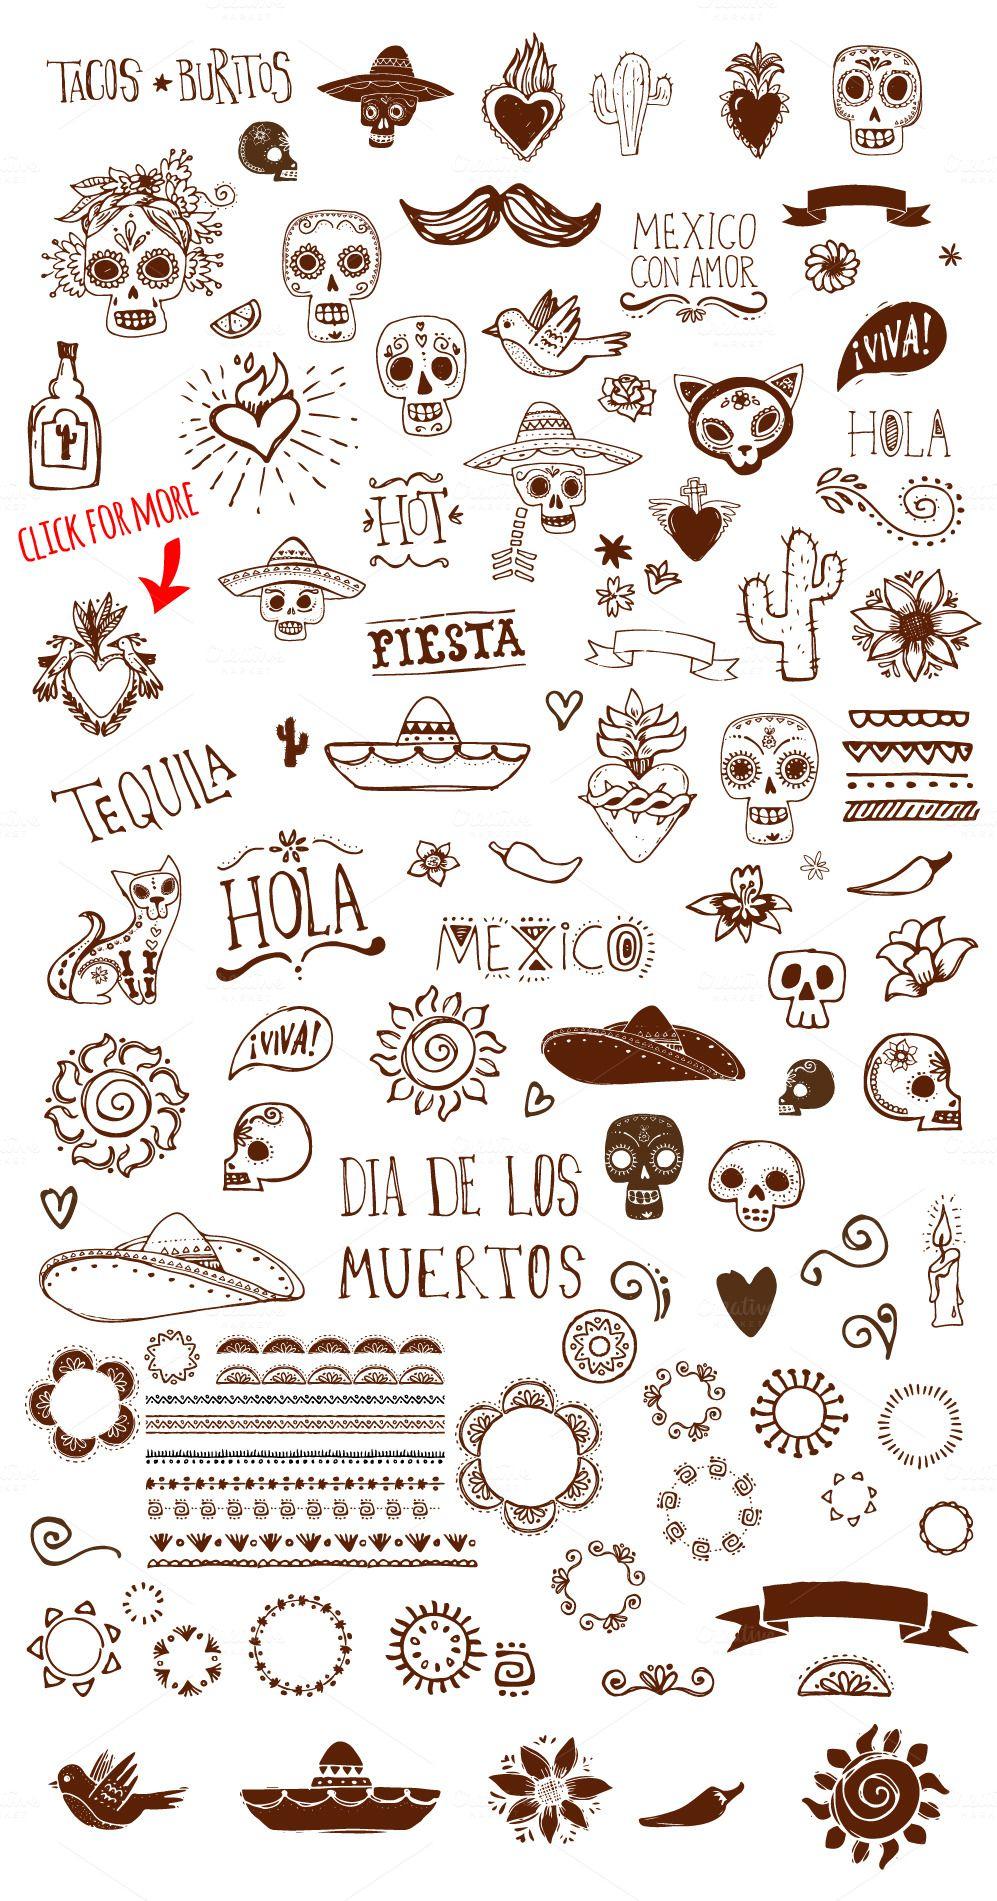 Small Mexican Tattoos : small, mexican, tattoos, Mexican, Drawn, Doodles, Tattoo, Templates,, Mexico, Tattoo,, Hands